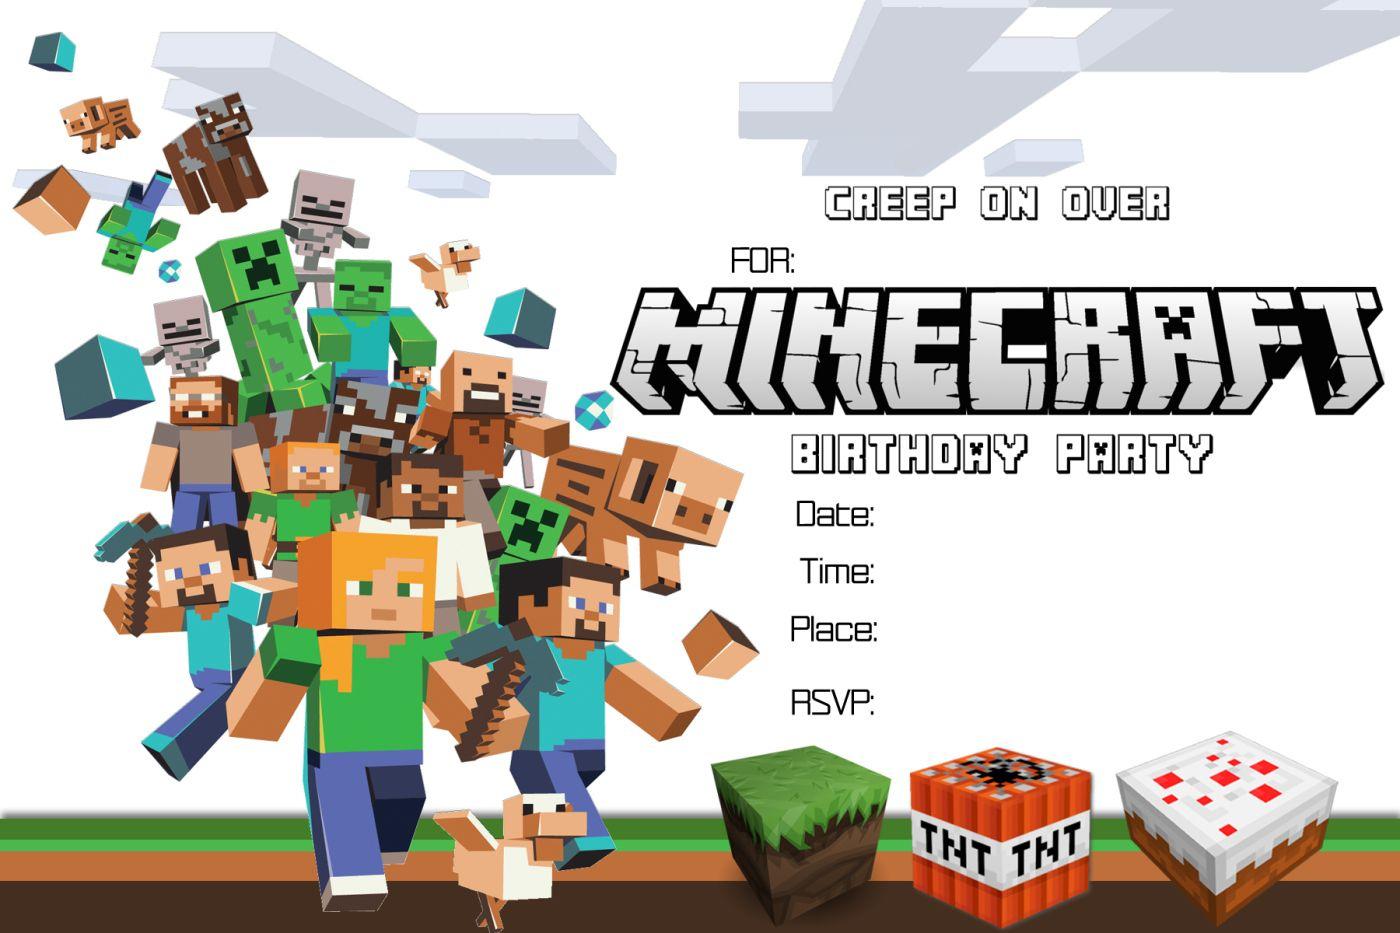 Free Minecraft Birthday Invitation Printable!!!! | Craftysusanita - Free Printable Minecraft Birthday Party Invitations Templates